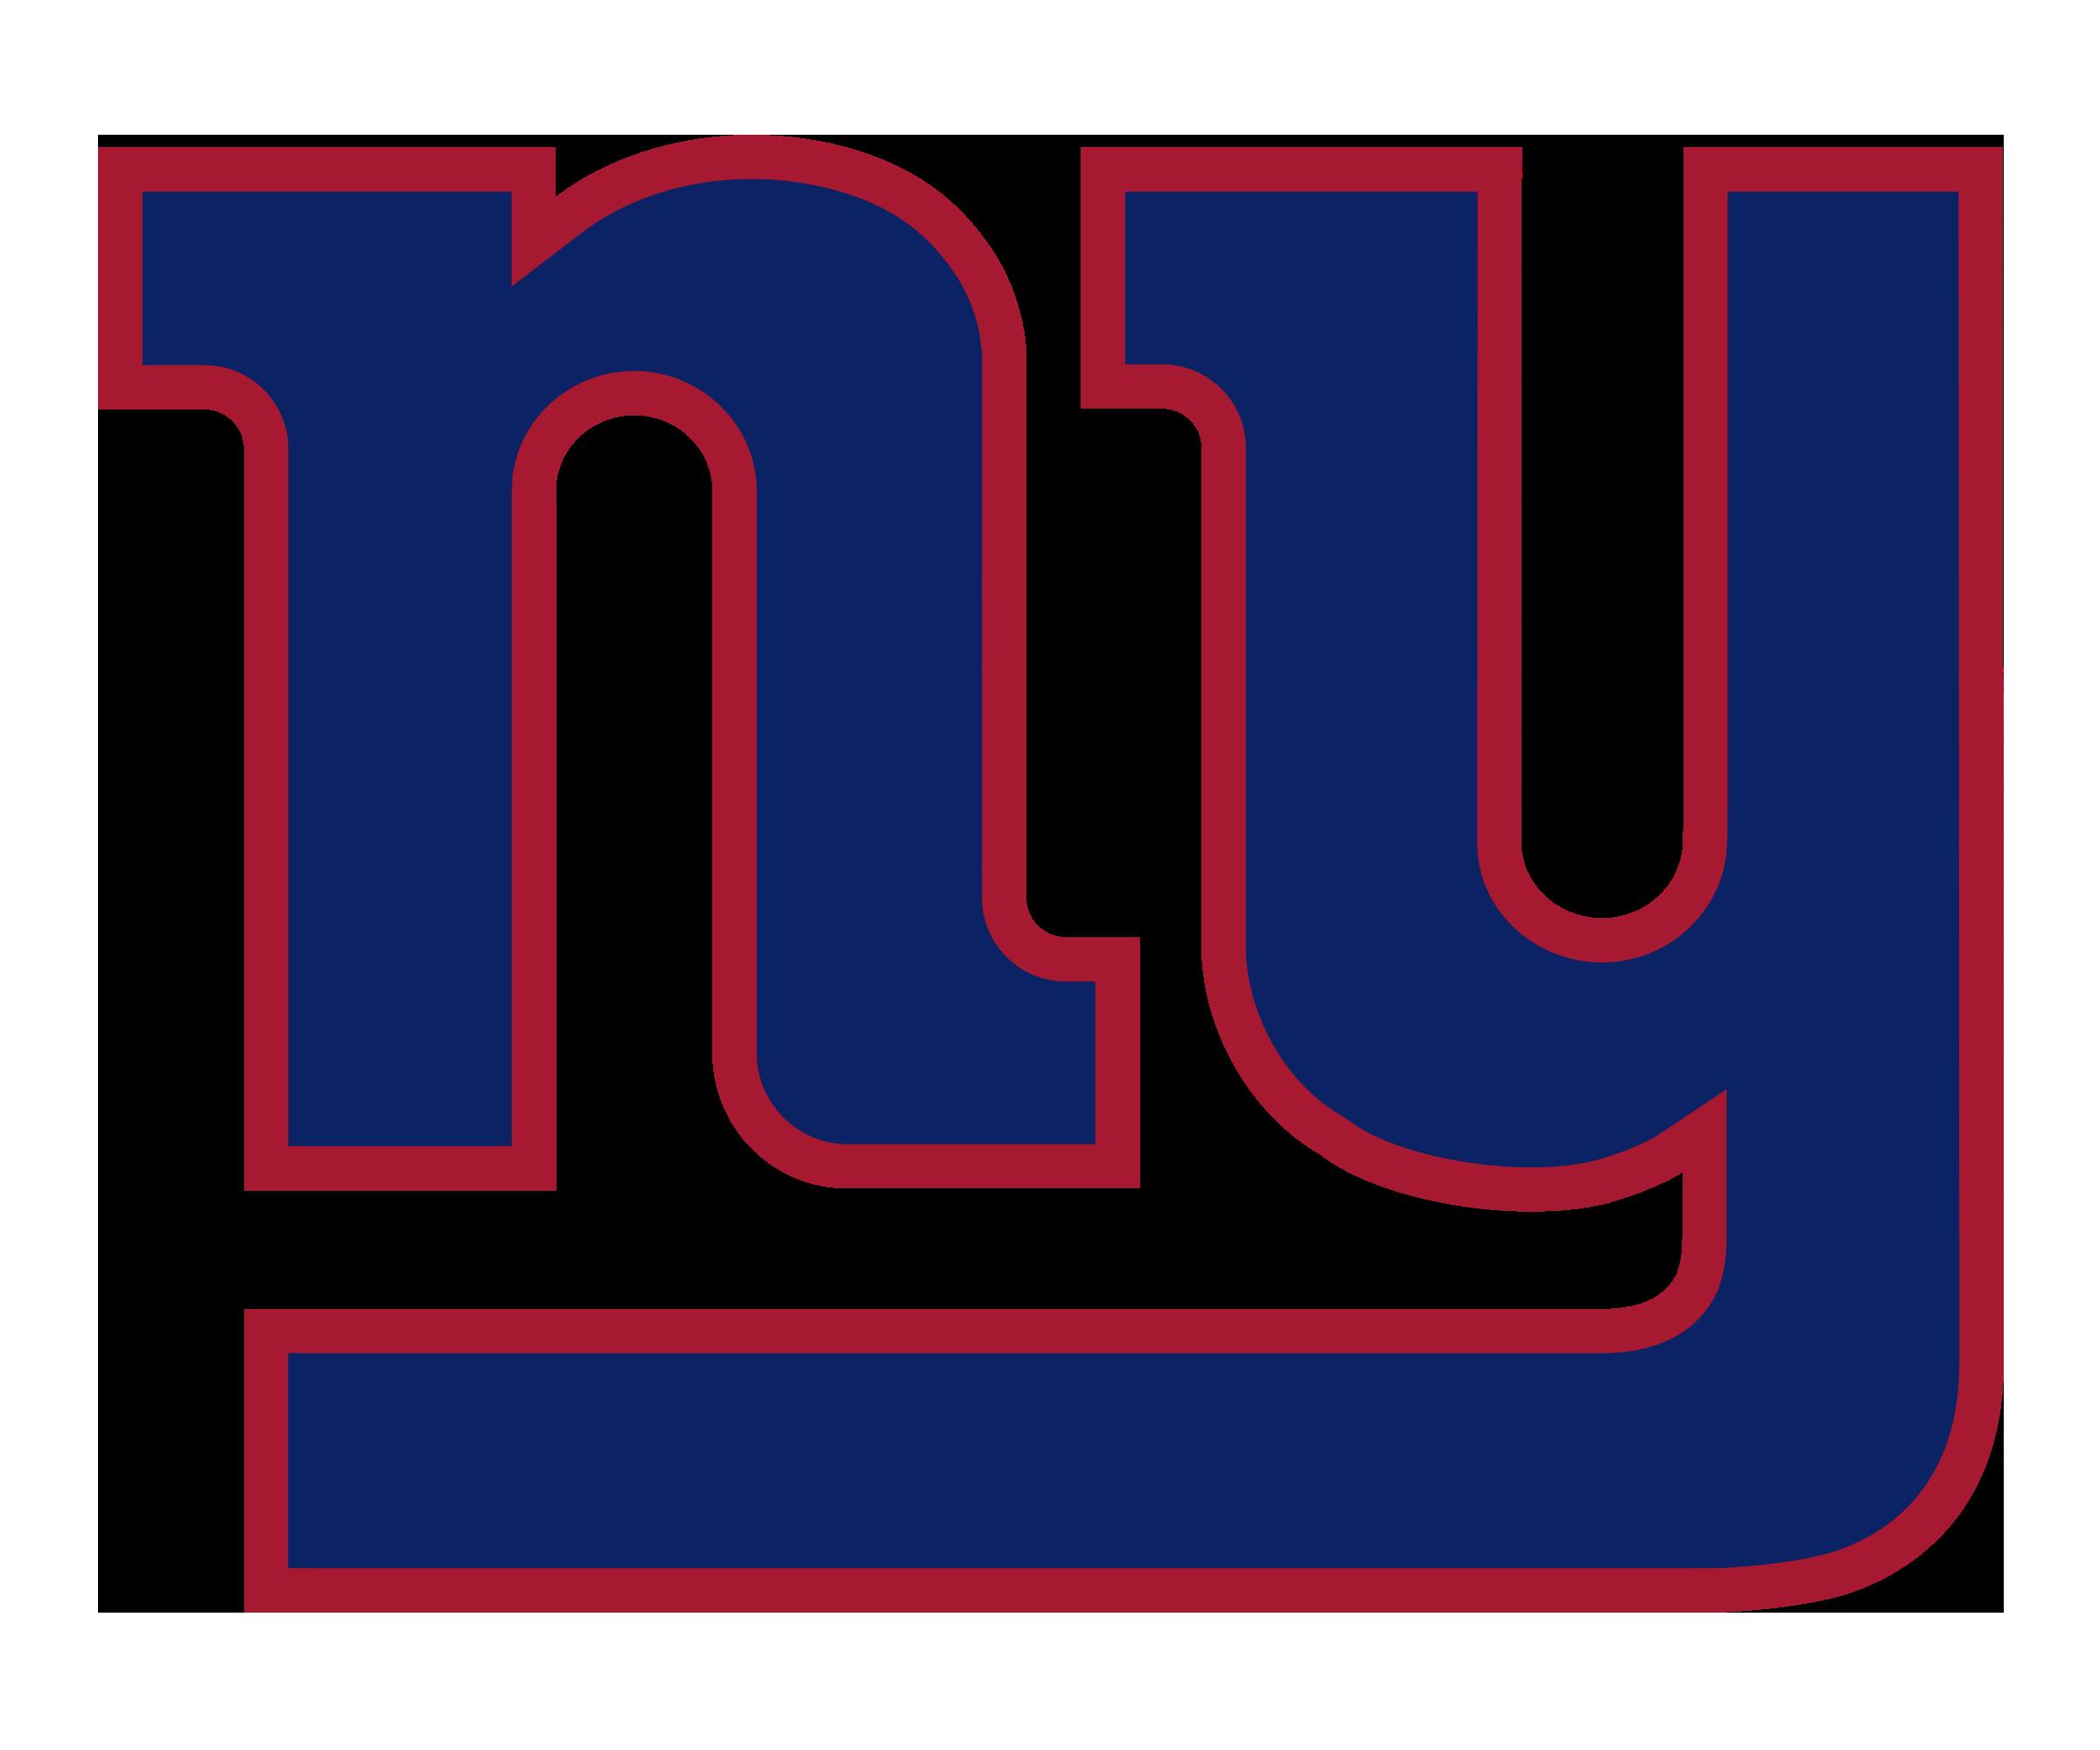 new-york-giants-logo-transparent.png